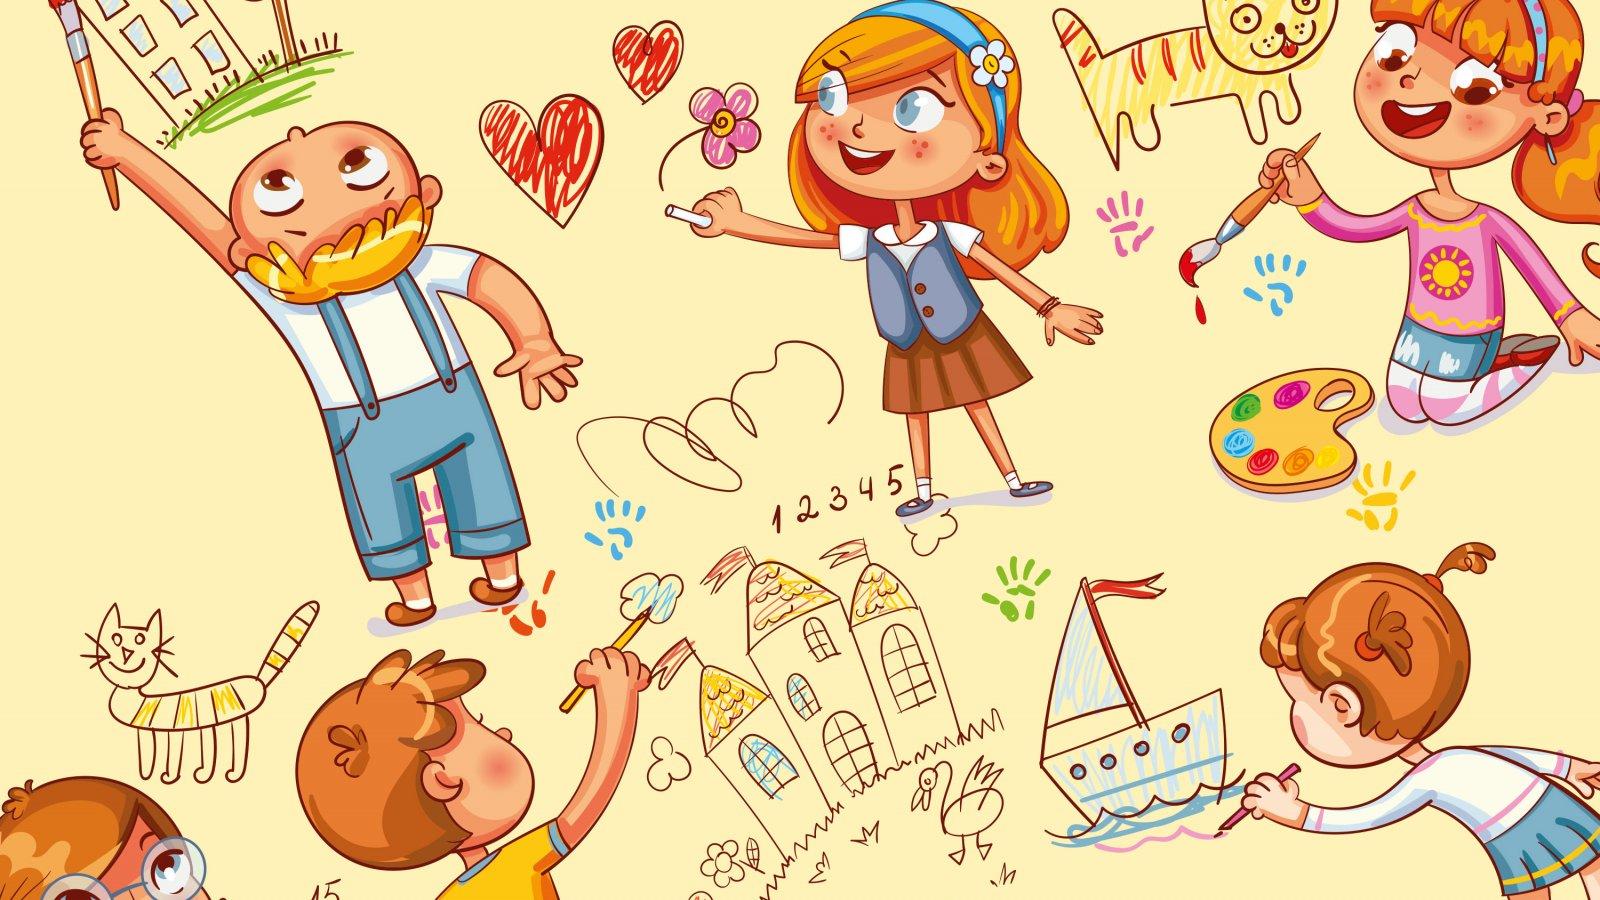 animatorka_bg_3000x2000px.jpg